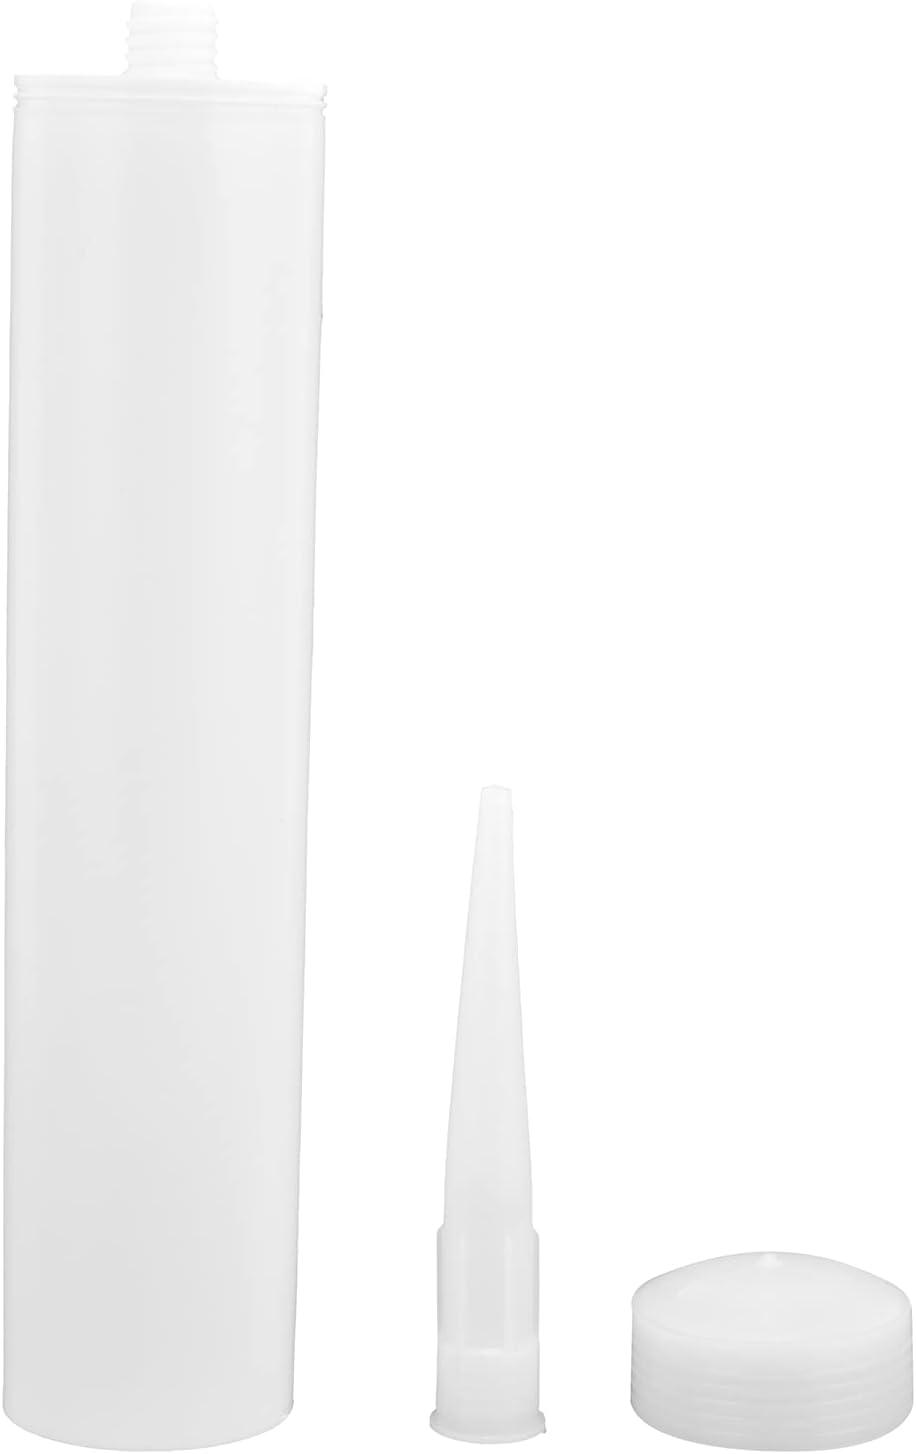 YIUS 5 Sets Caulk Tube 300ml PC Nozzle Sealant 4 years warranty Squeeze SALENEW very popular Caulking